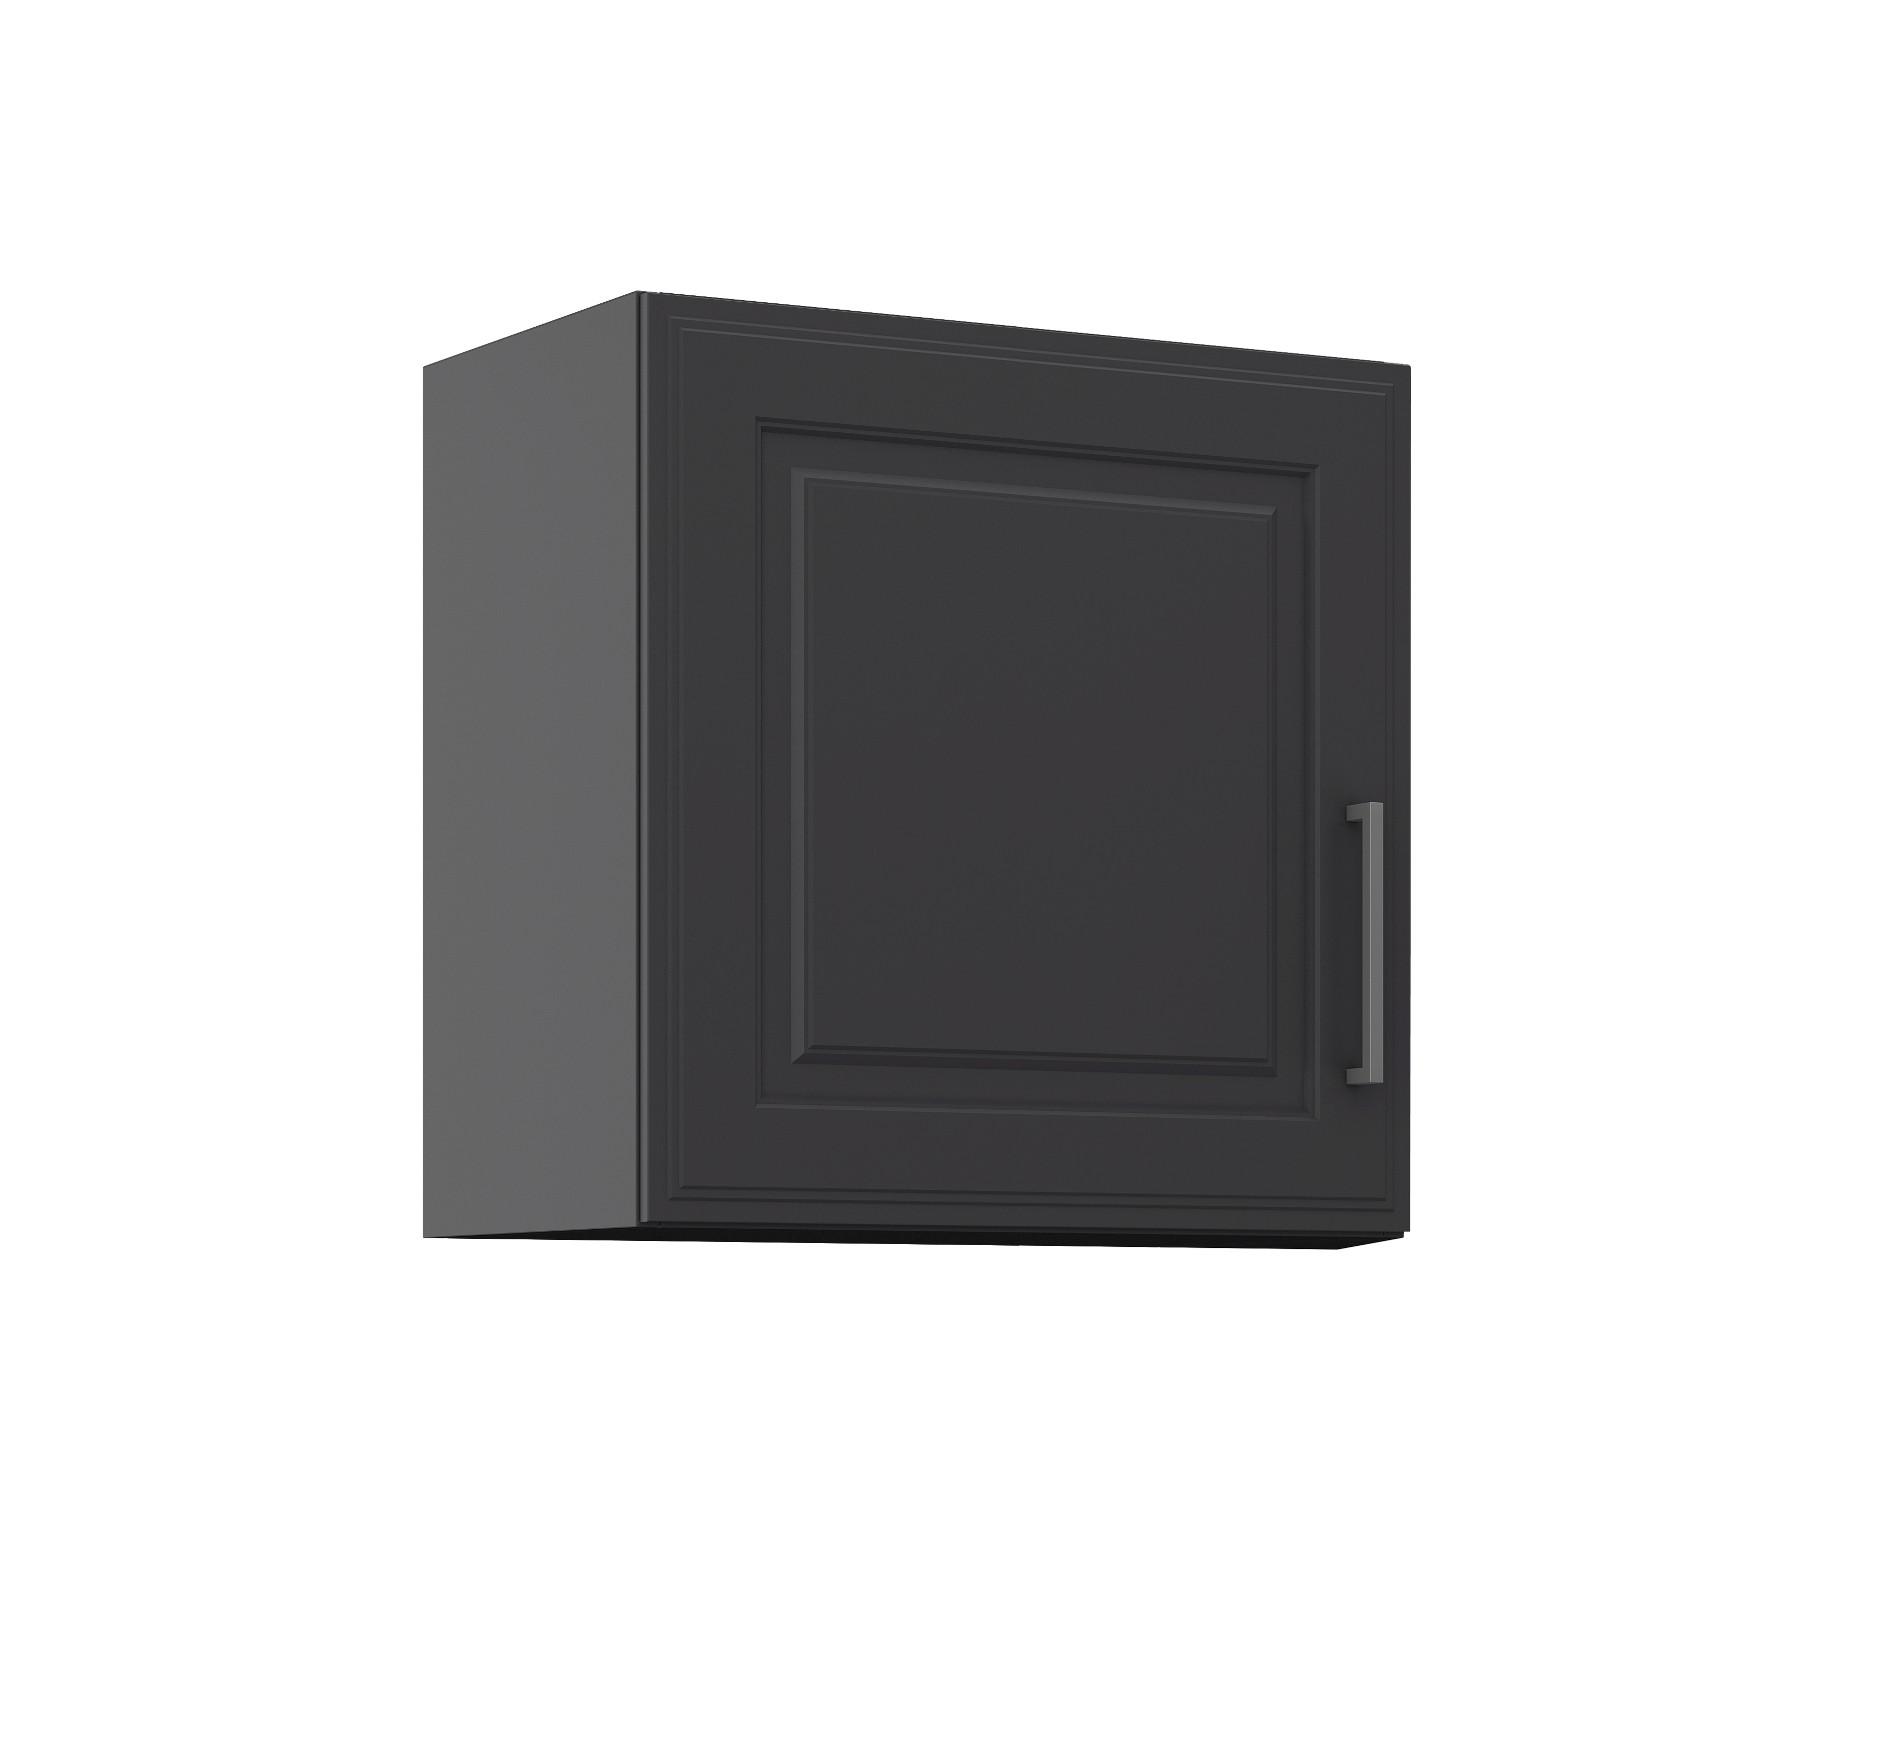 k chen h ngeschrank k ln 1 t rig breite 60 cm grau graphit k che k ln. Black Bedroom Furniture Sets. Home Design Ideas